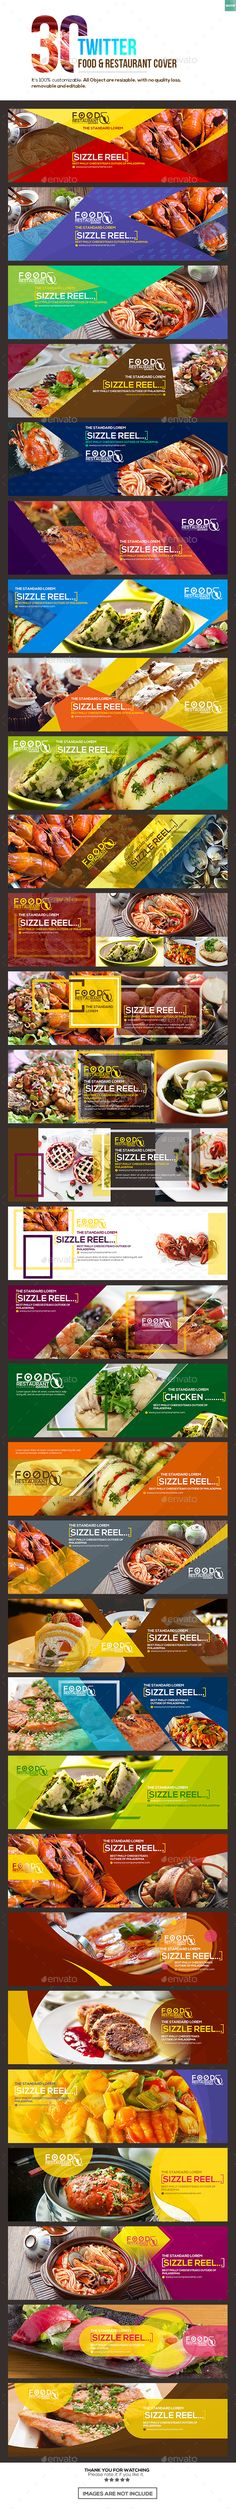 30 Twitter Food & Restaurant Cover  — PSD Template #insta #social media banner • Download ➝ https://graphicriver.net/item/30-twitter-food-restaurant-cover/18487722?ref=pxcr